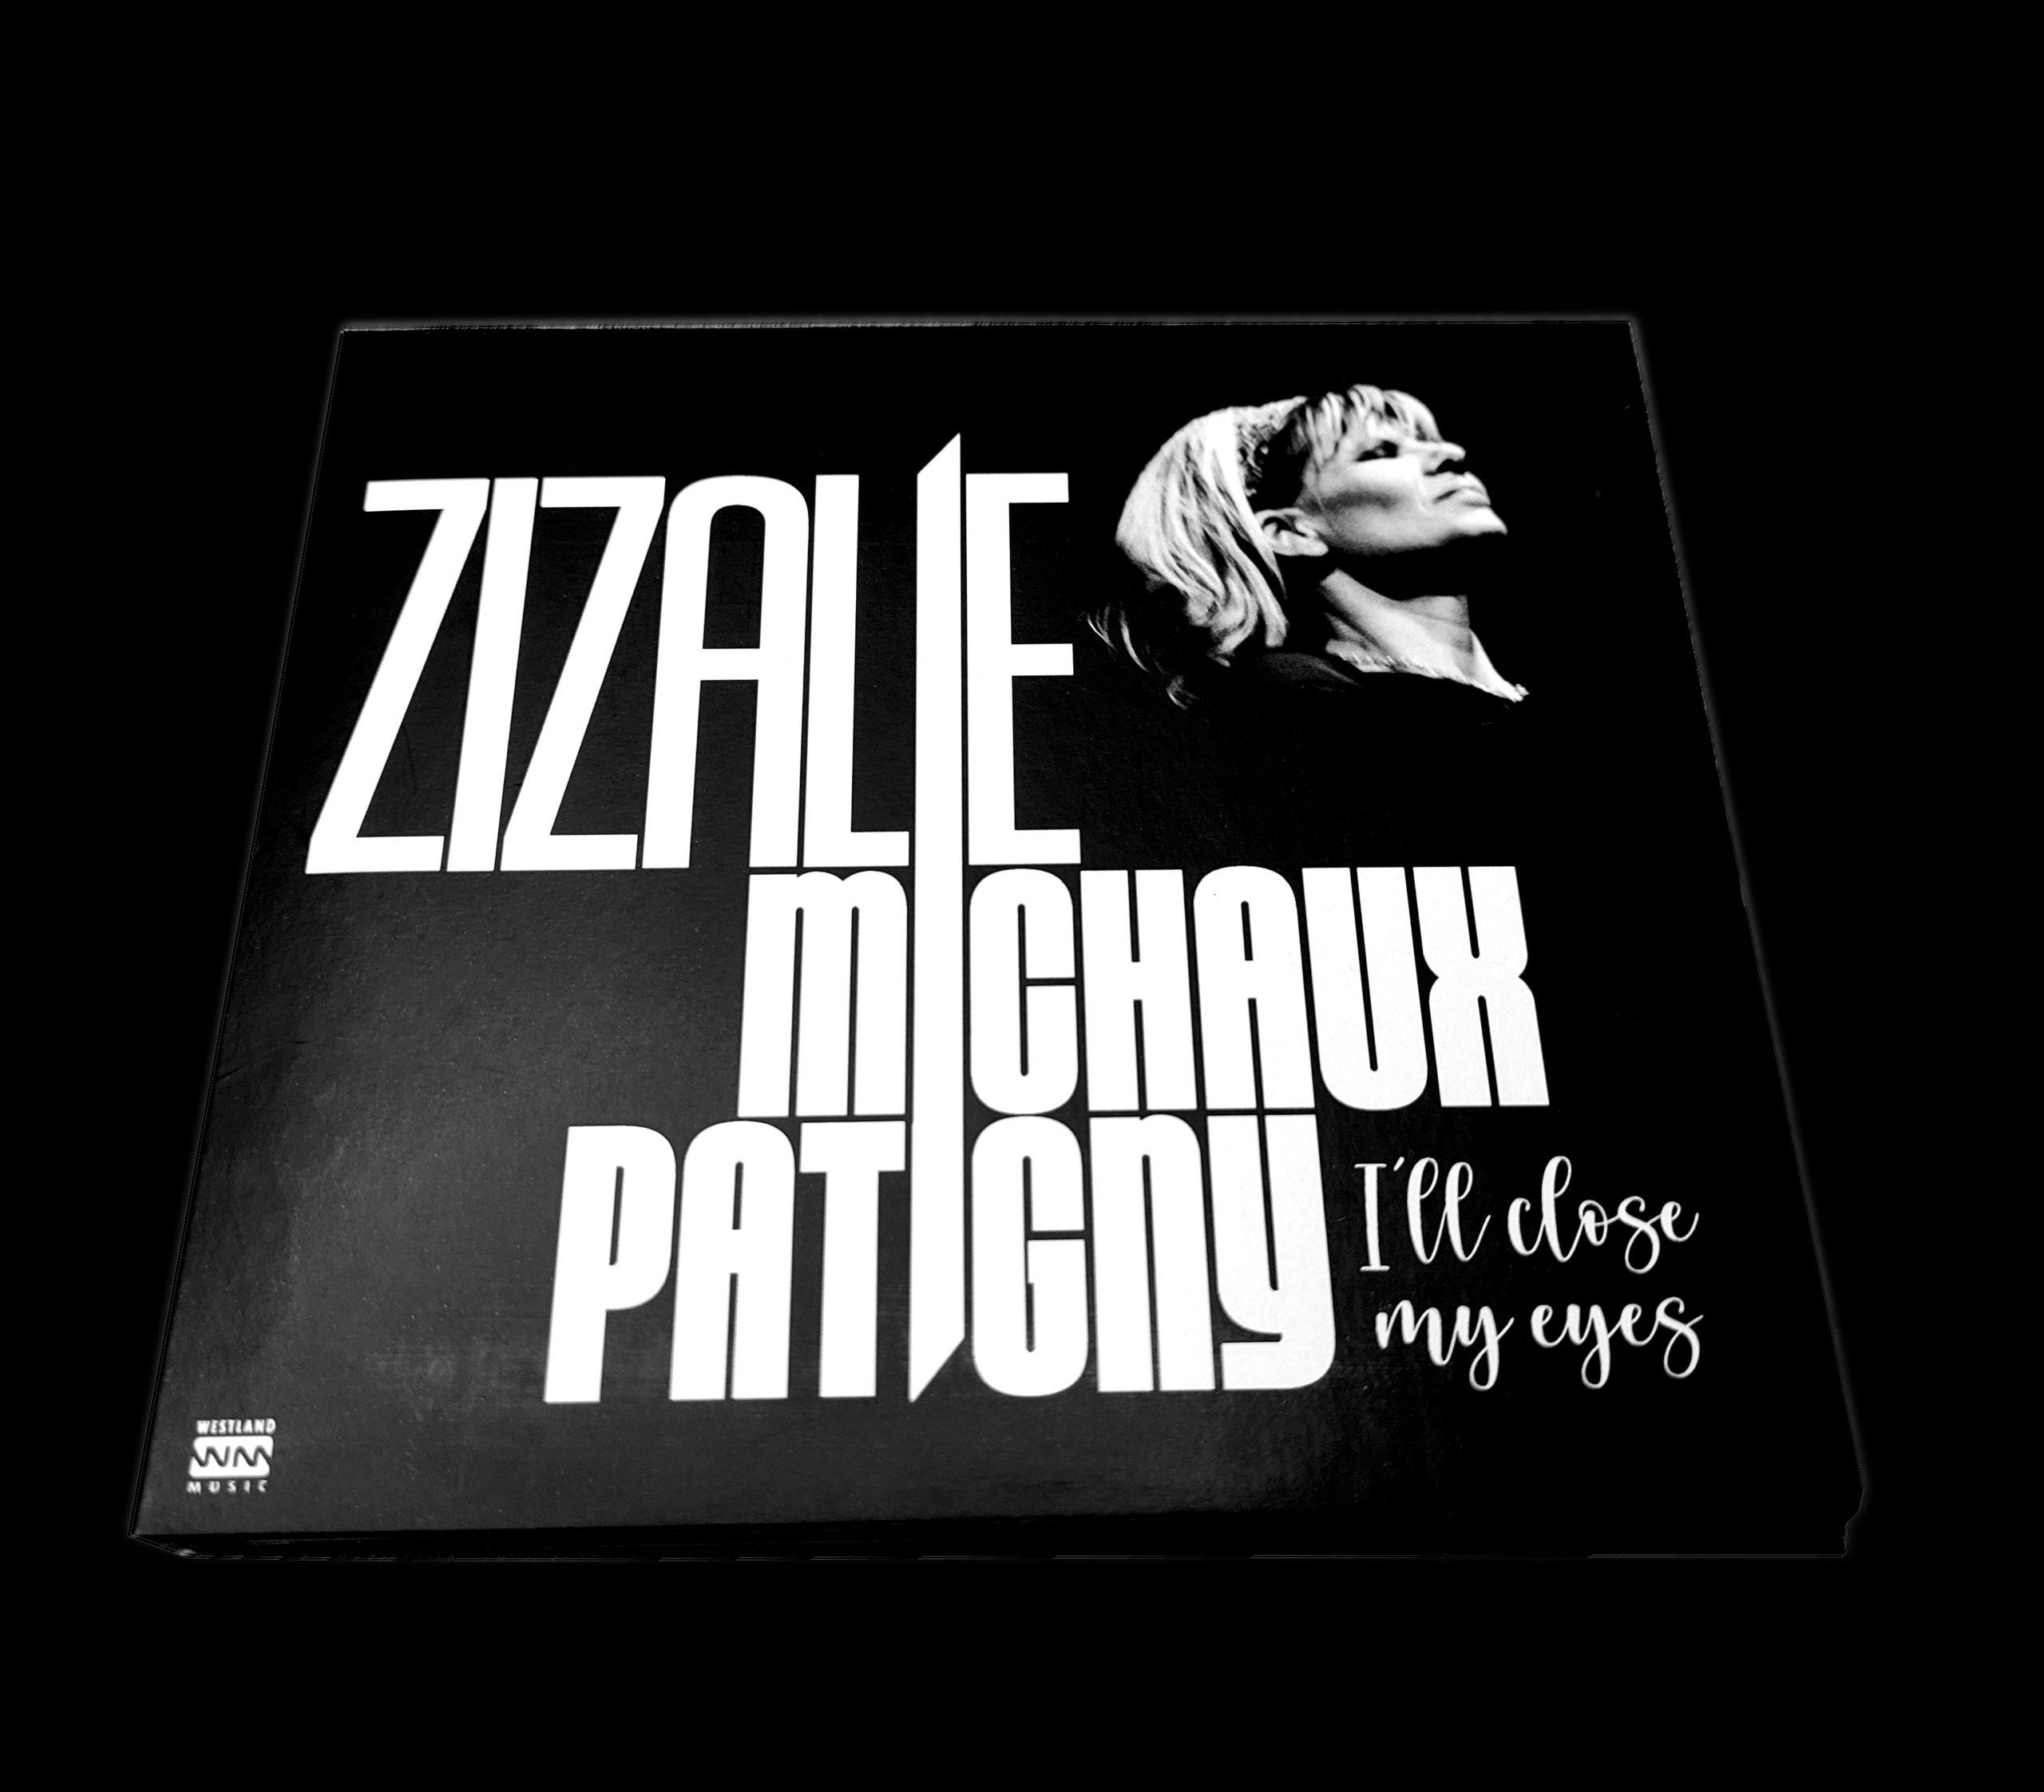 Zizalie